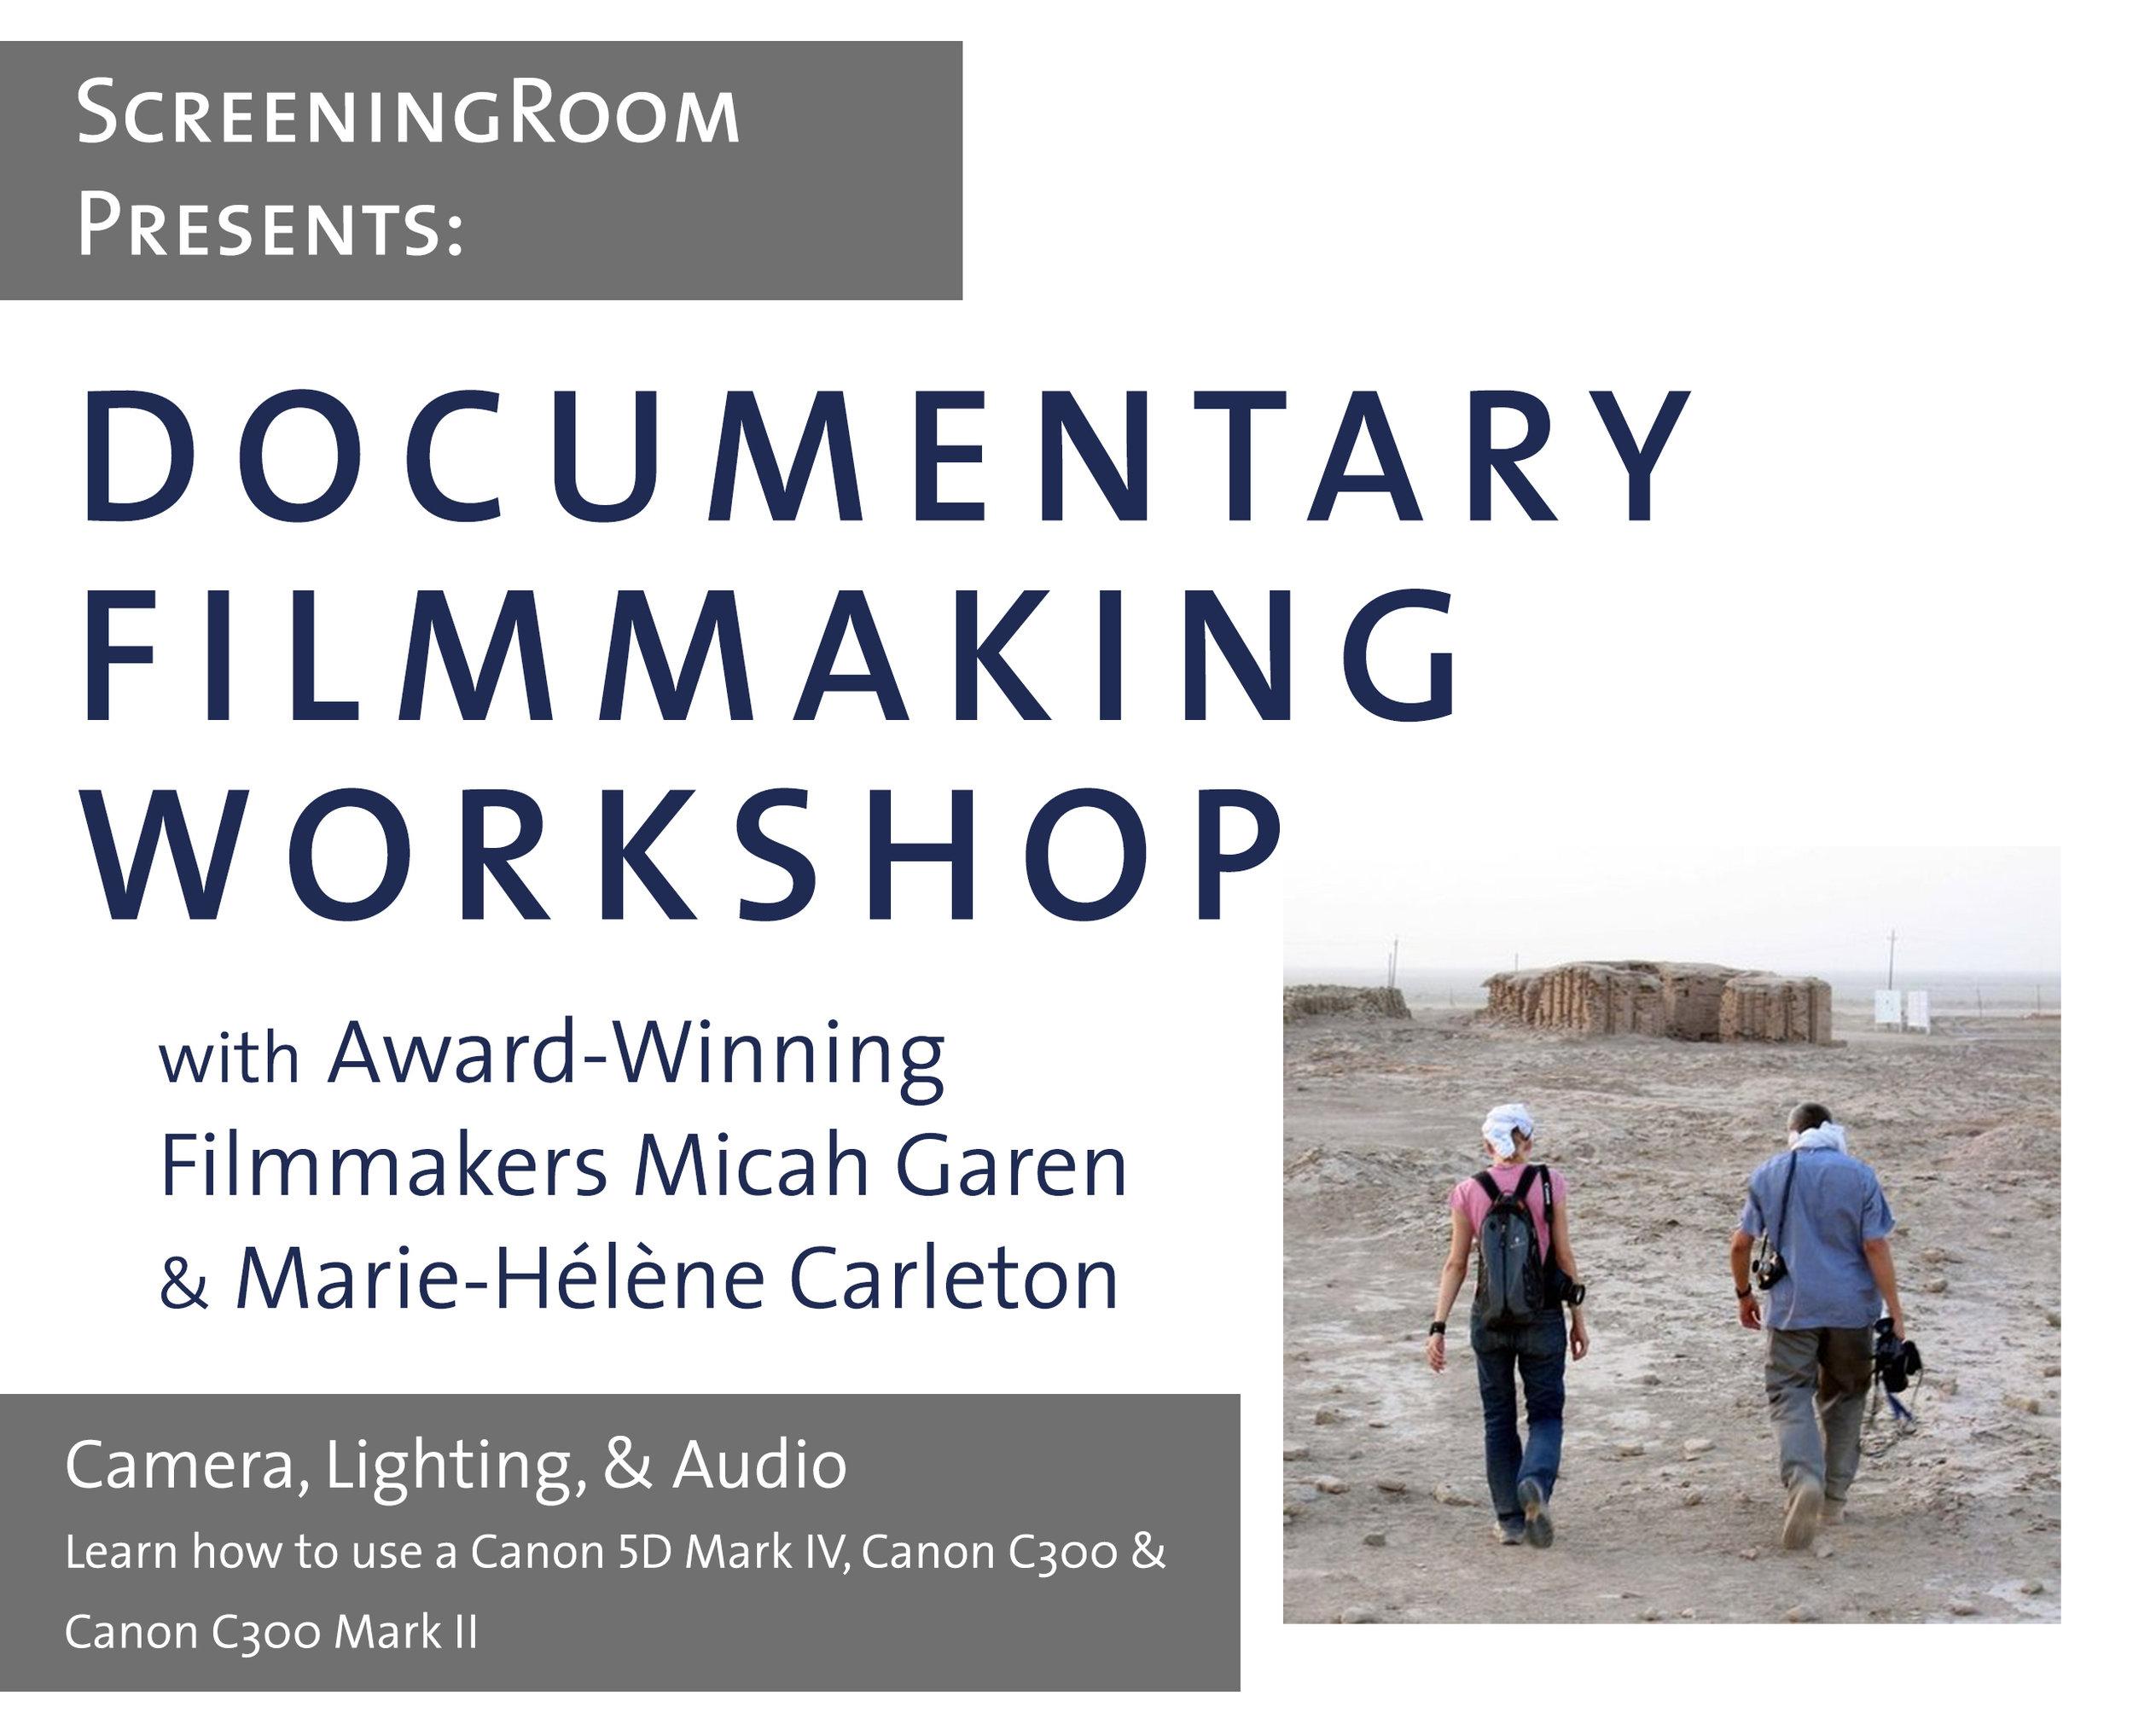 Doc Filmmaking Workshop Photo.jpg